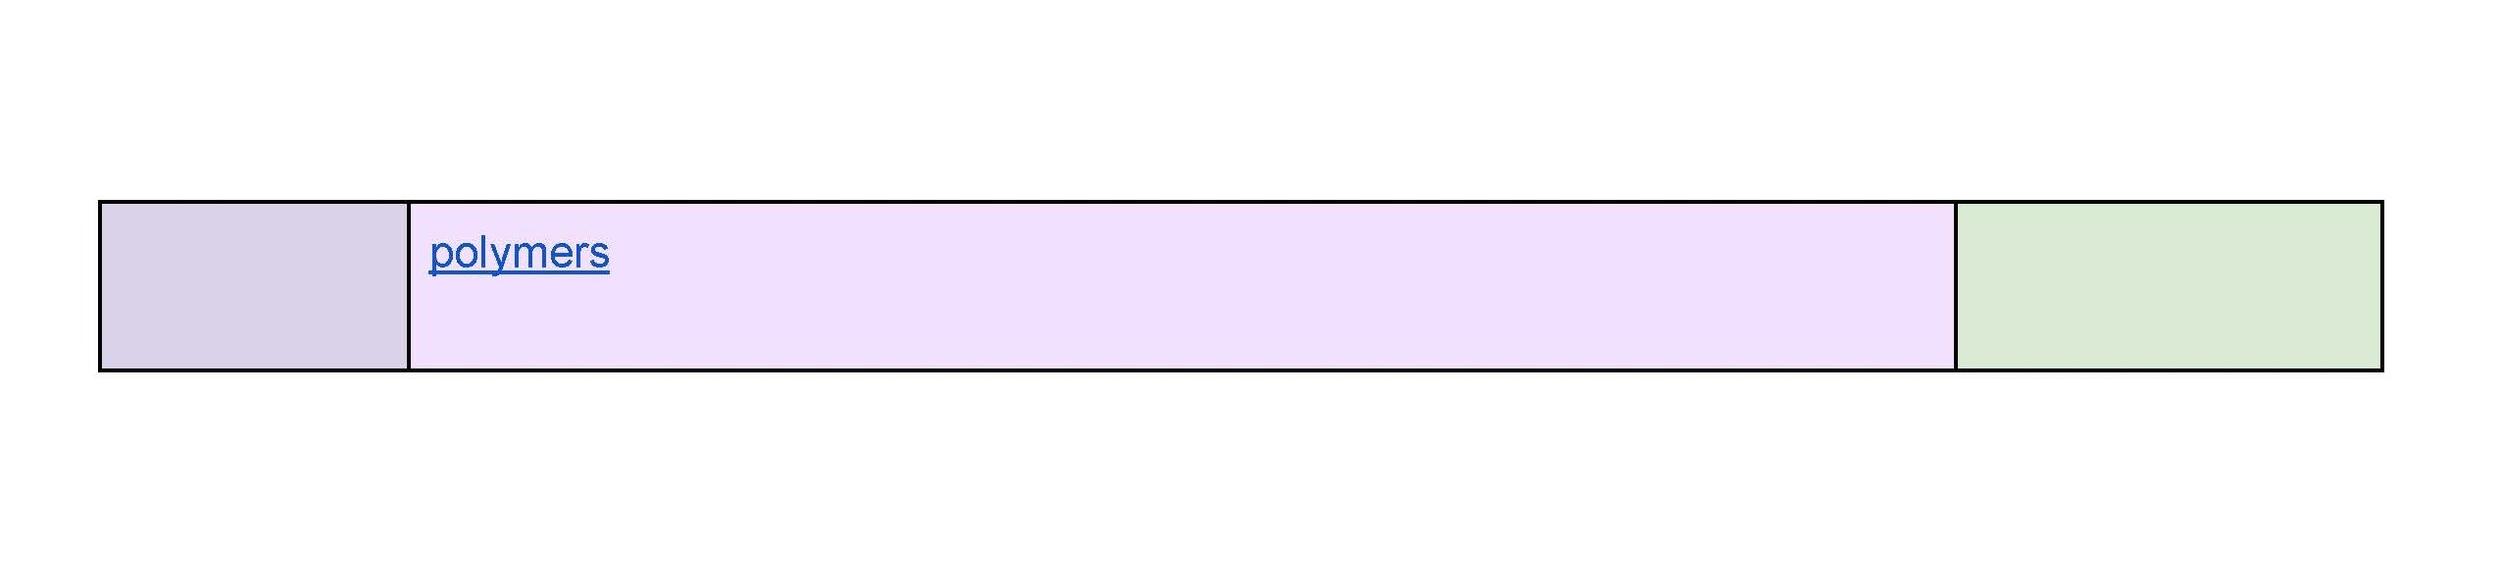 Bouncing Bonds Lab 3-5 (1)_Page_4.jpg